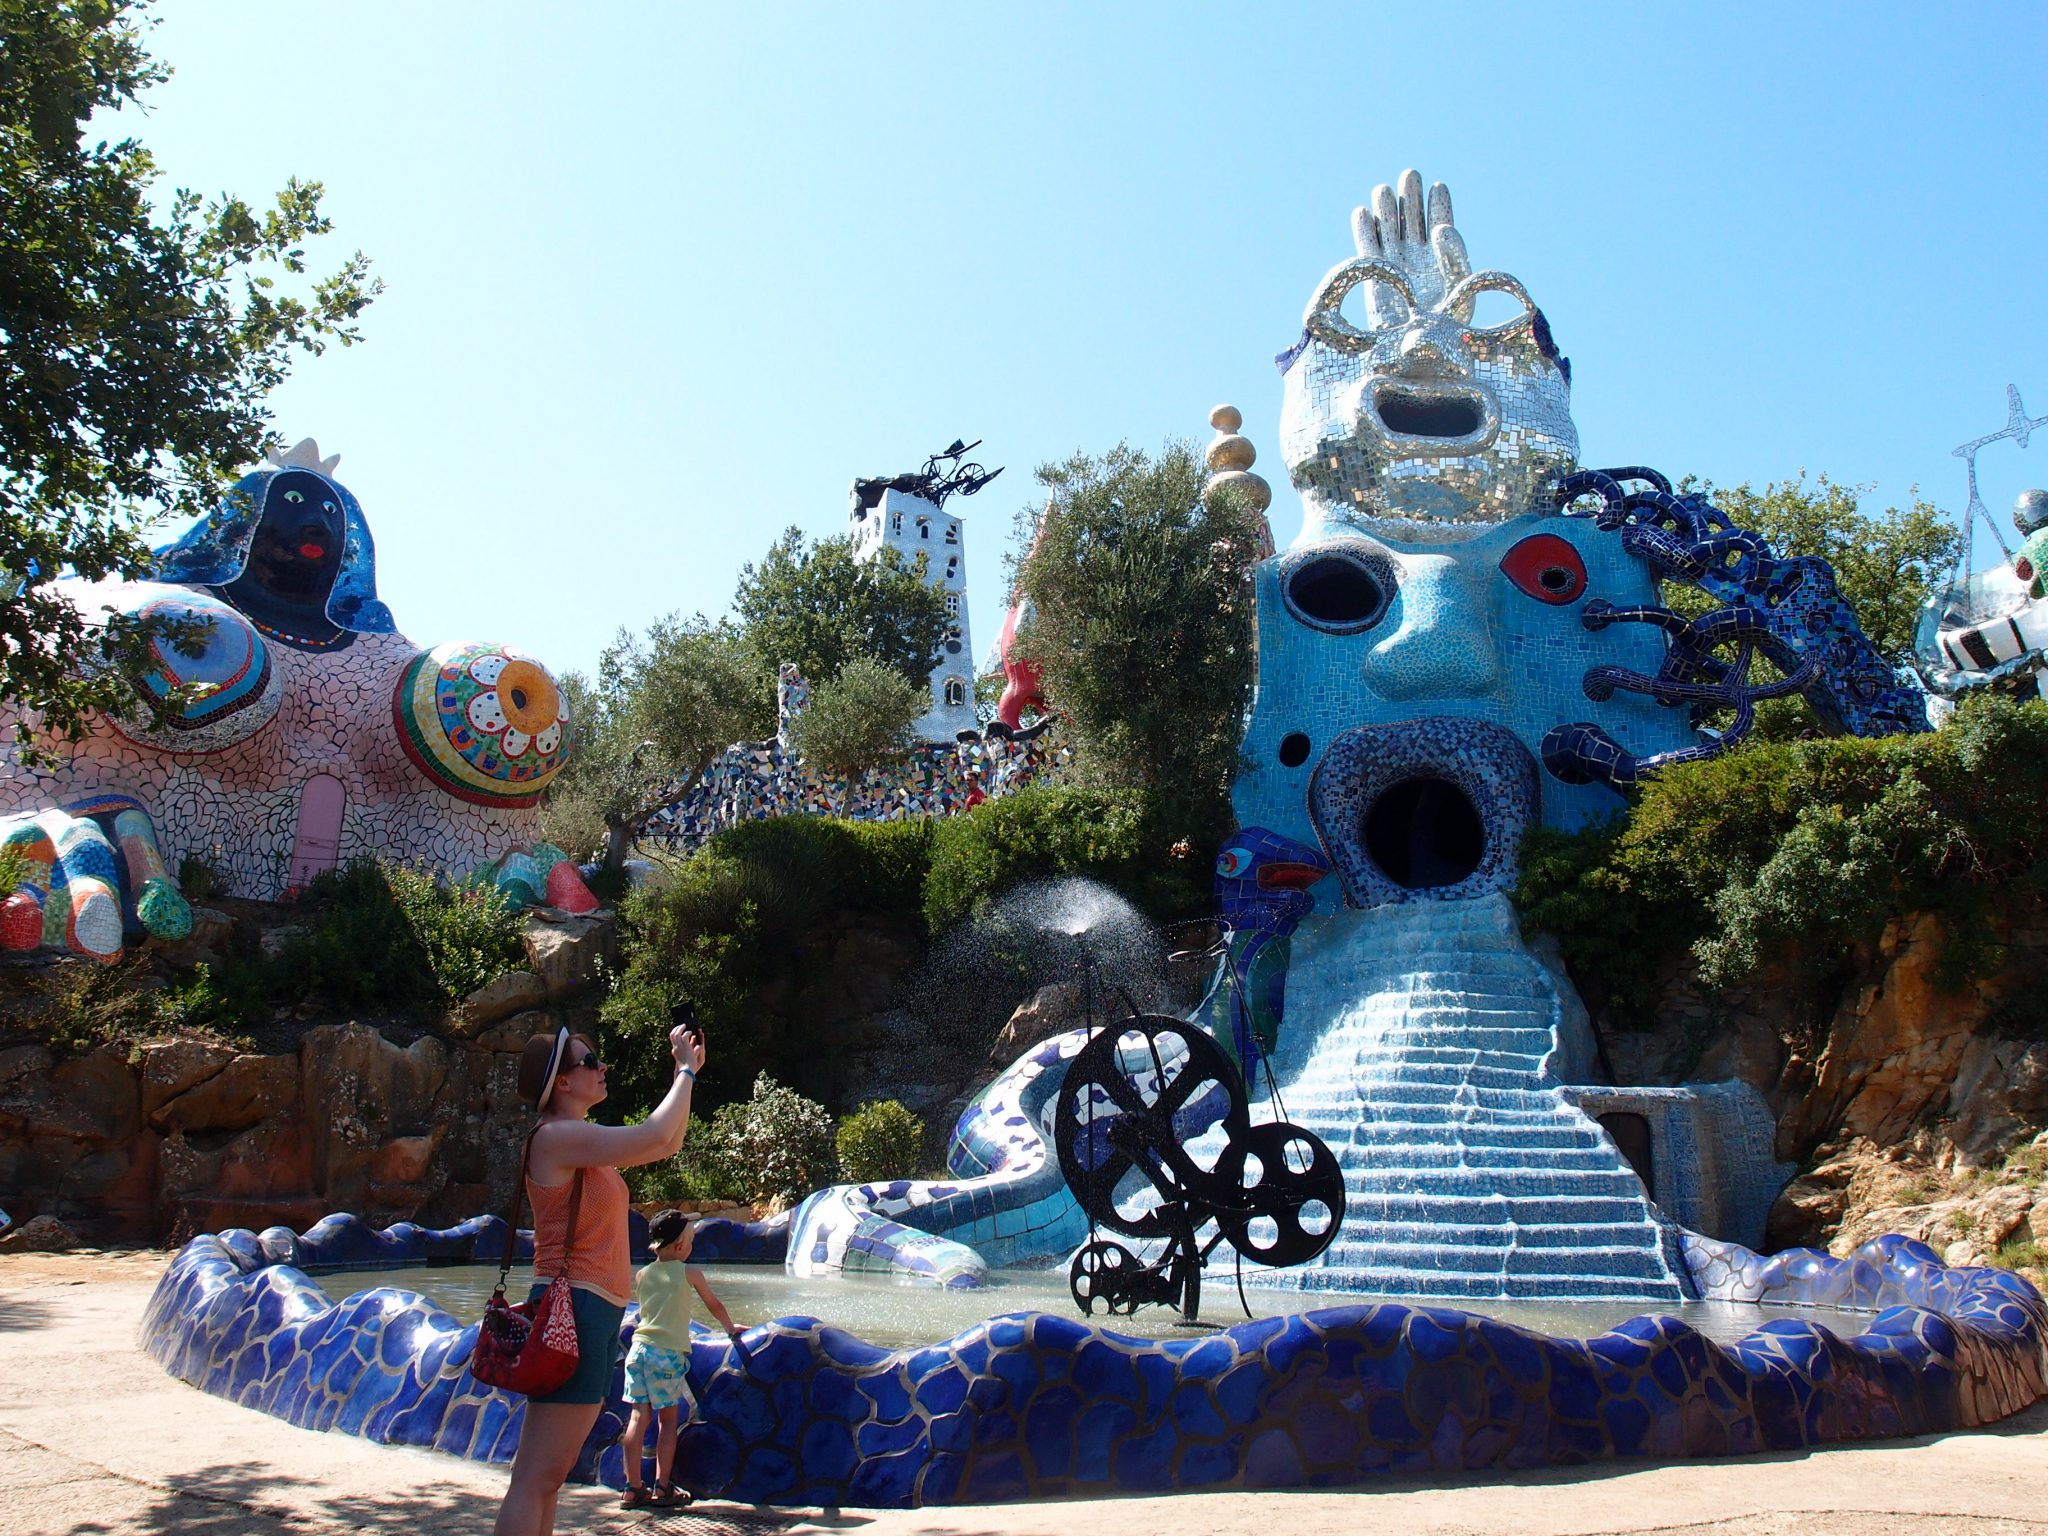 y final look at the Tarot Garden